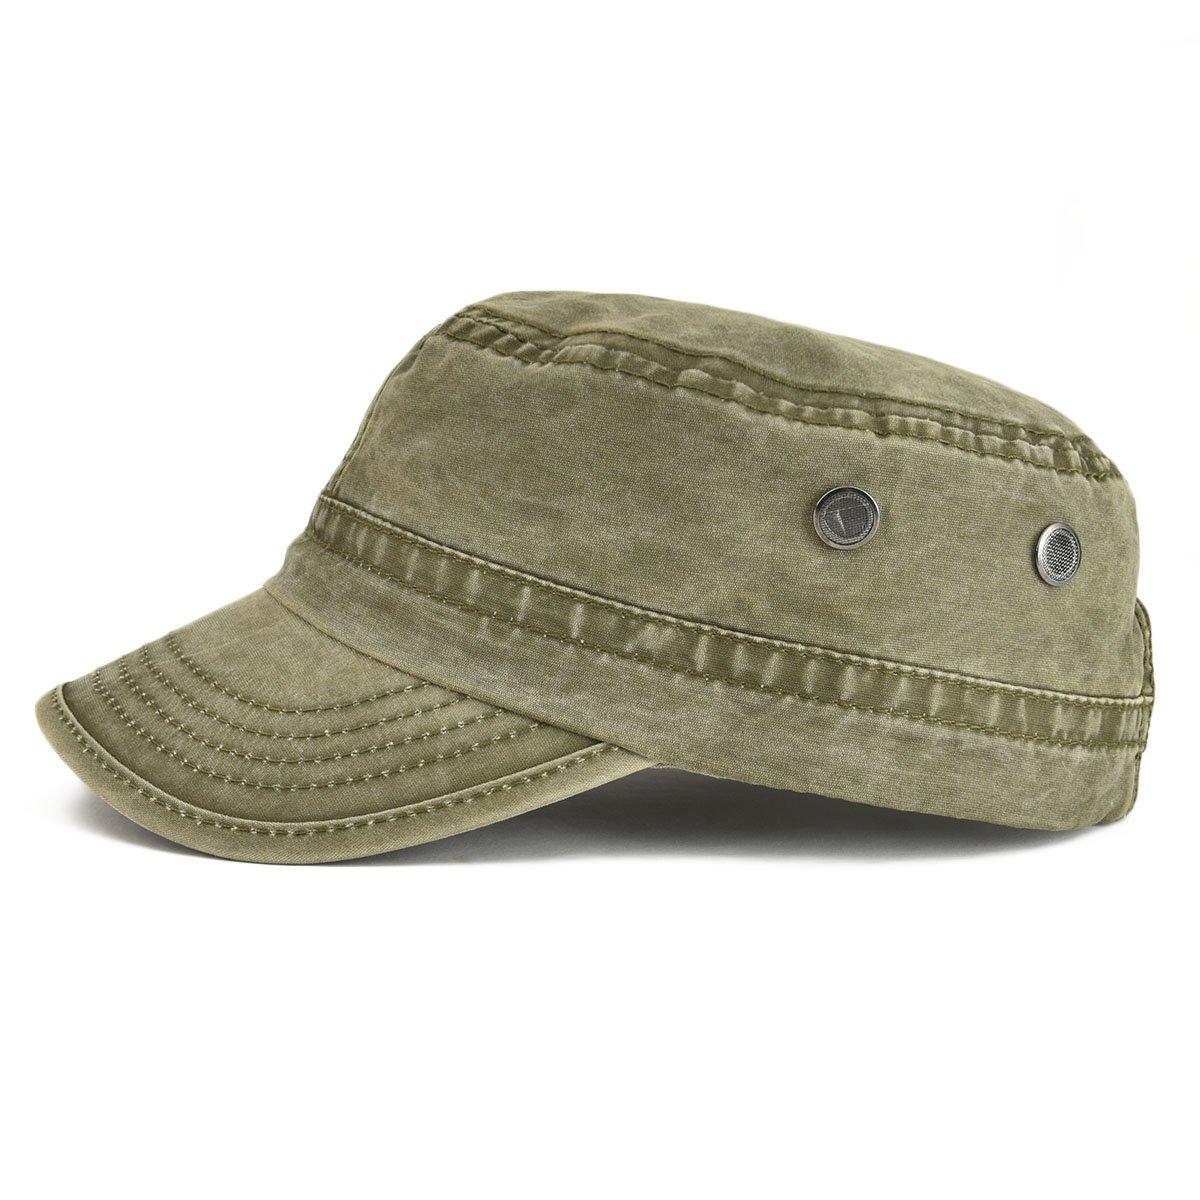 449c3ce90 VOBOOM Washed Cotton Military Caps Cadet Army Caps Unique Design Vintage  Flat Top Cap